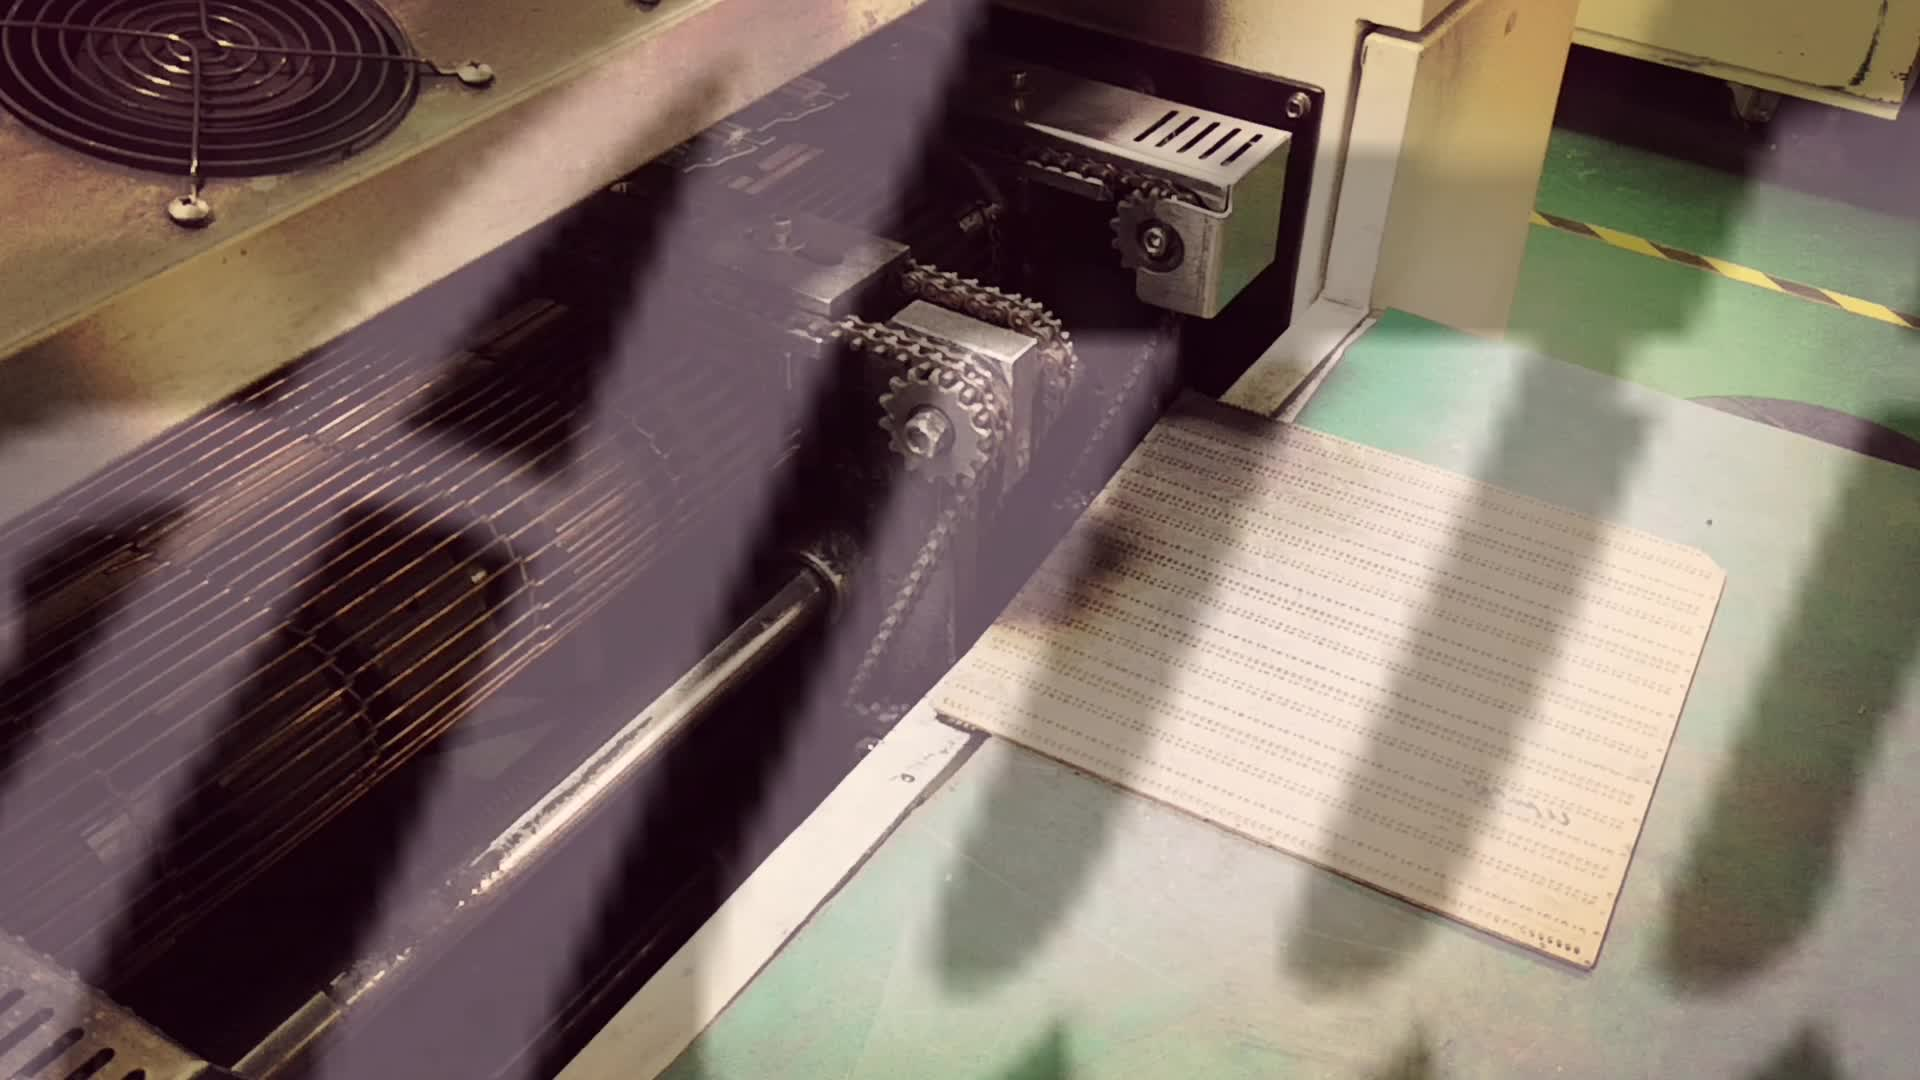 JAGUAR Small Size SMT Lead Free Reflow Oven Machine/Reflow Solder for pcb Soldering